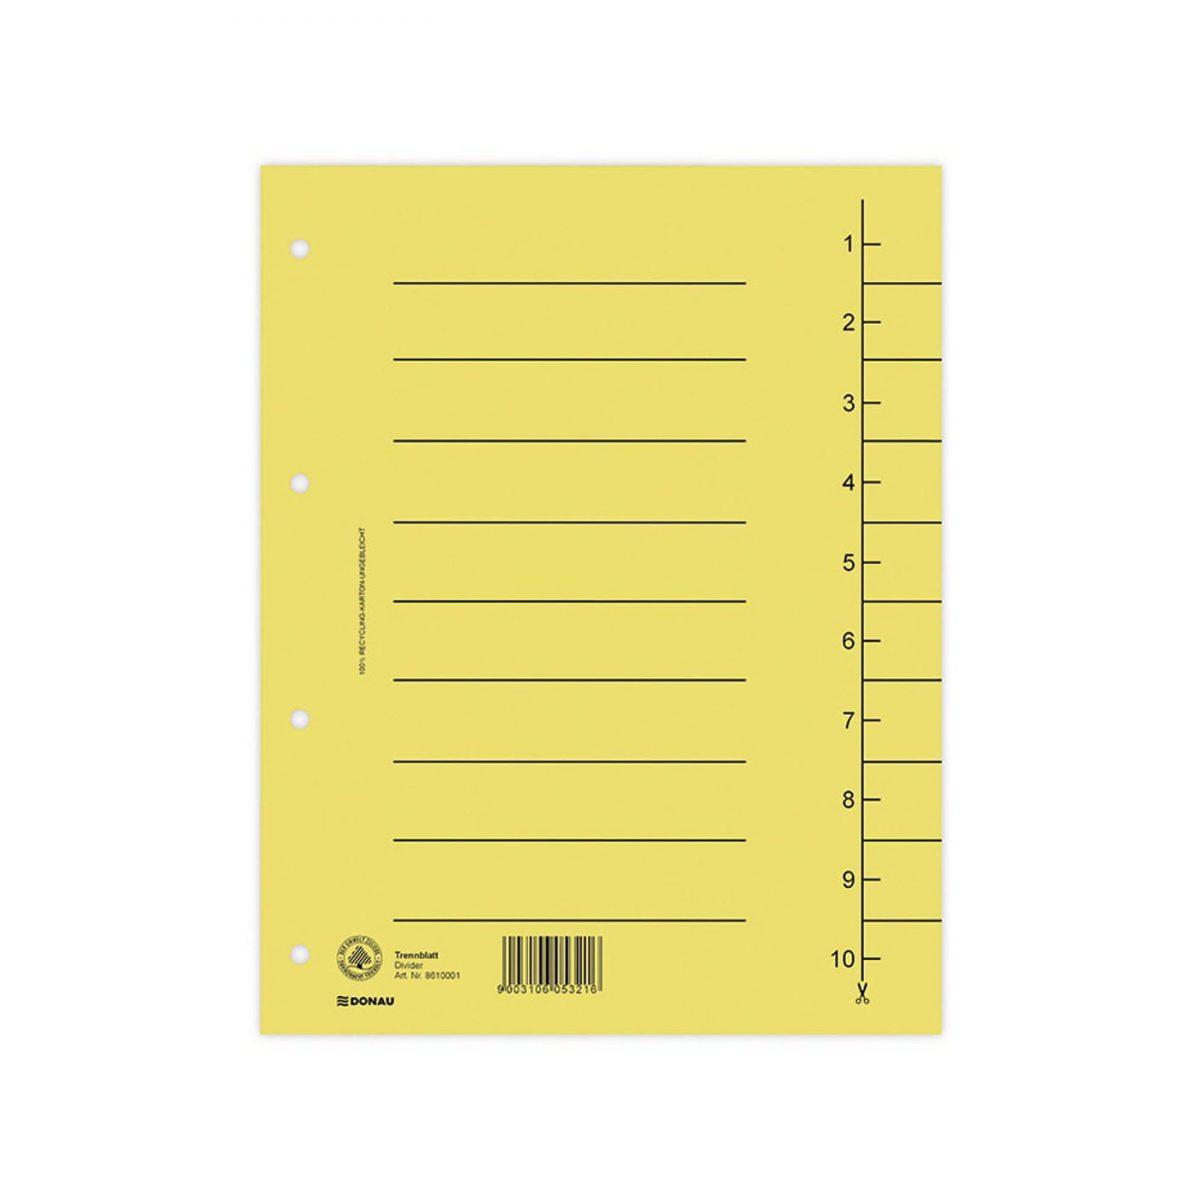 Separatoare carton manila 250g/mp, 300 x 240mm, 100/set, DONAU - galben